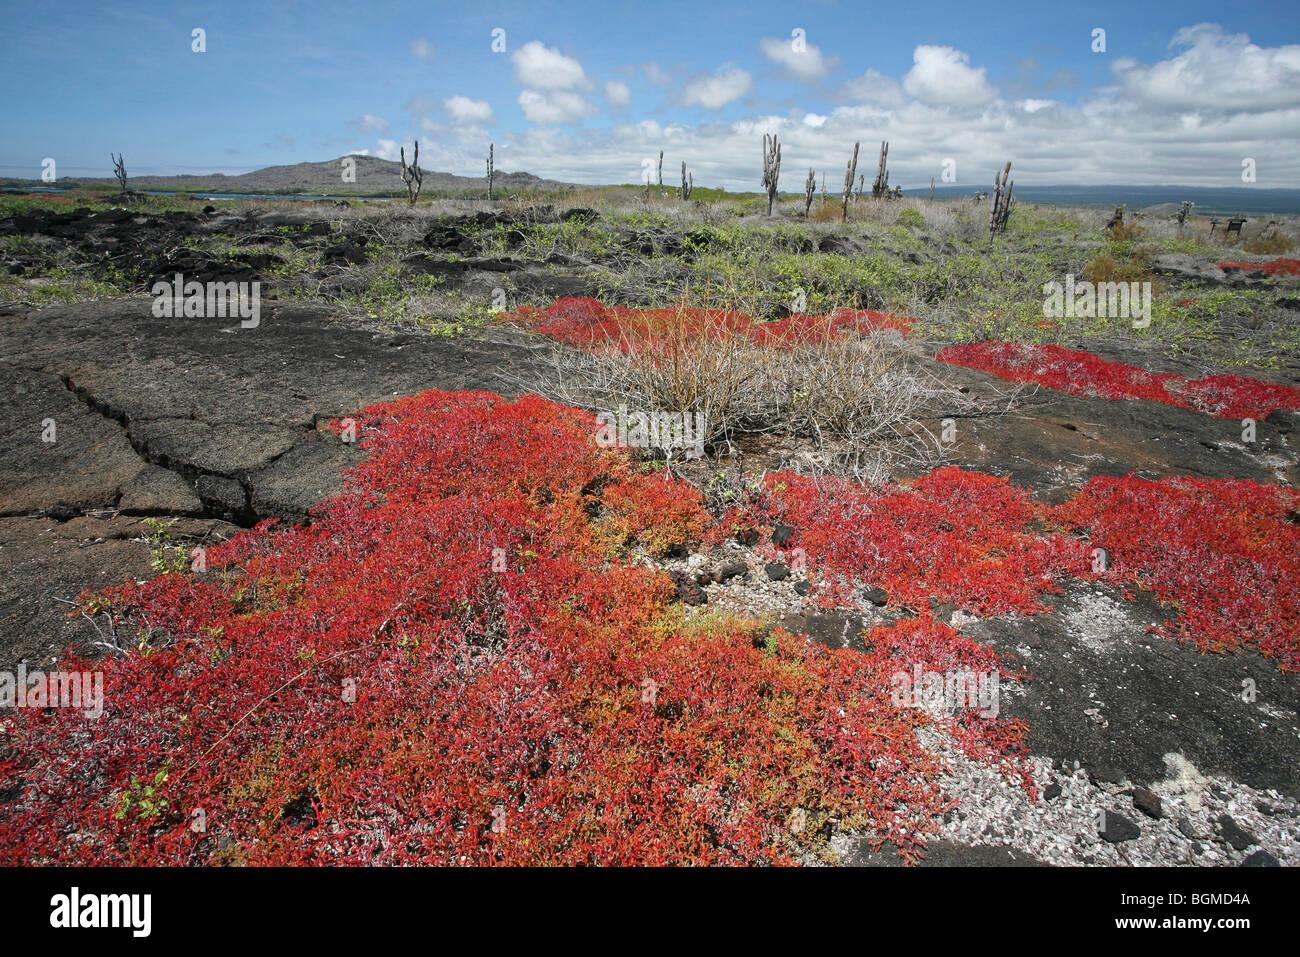 Vegetation on volcanic lava field, Isabela island, Galápagos Islands, Ecuador, Latin America - Stock Image